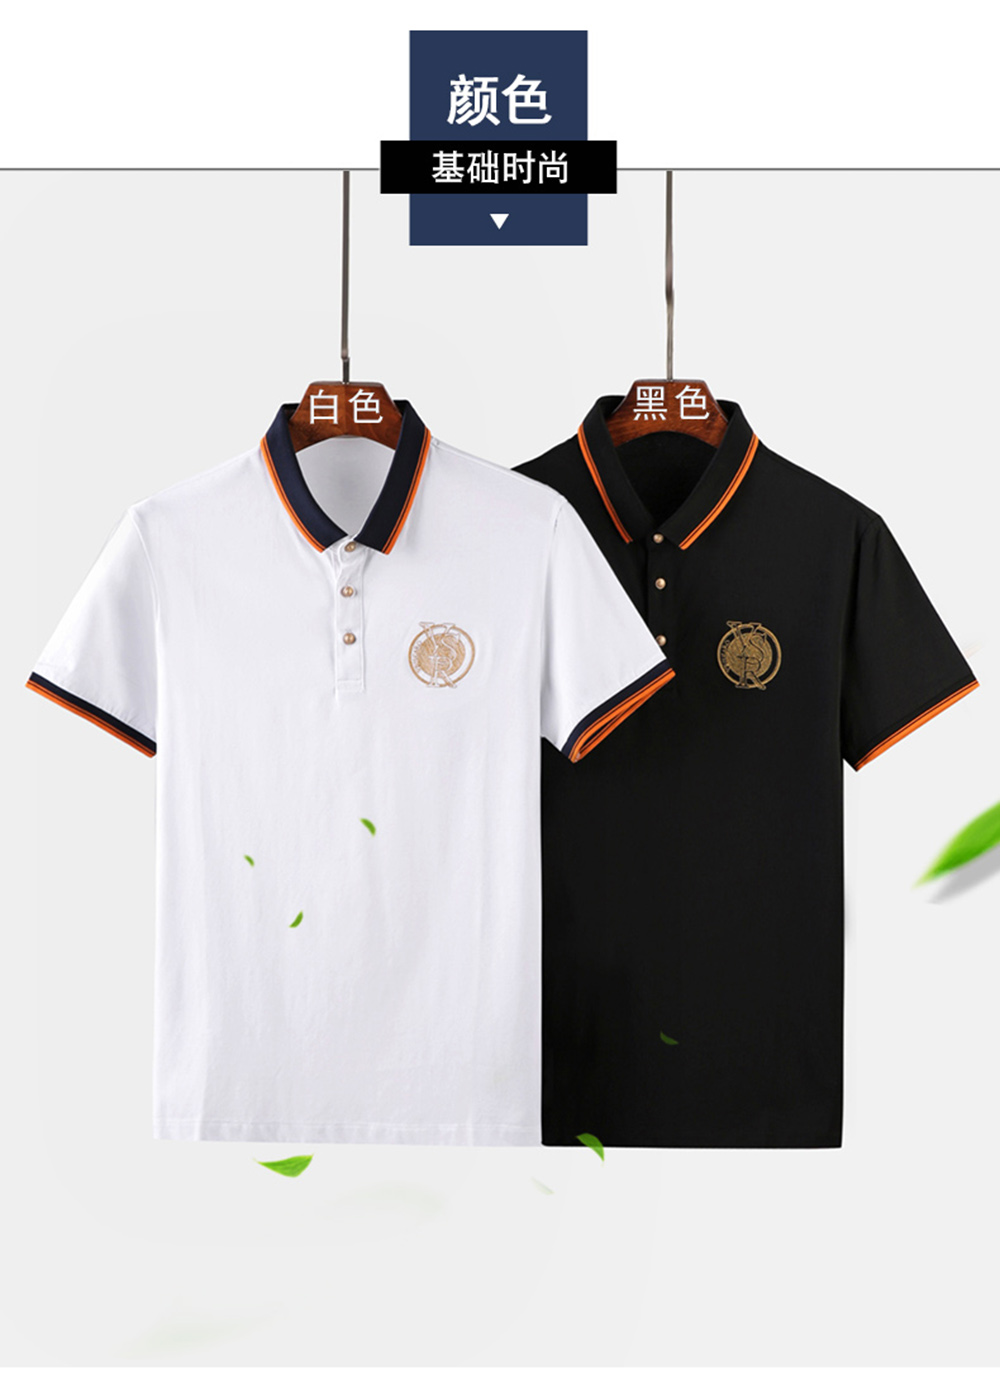 2018 New Arrival Brand Men\'s Summer Business Shirt Short Sleeves Turn-down Collar Polo Shirt Smart Casual pol Shirt Men Shirts (1)